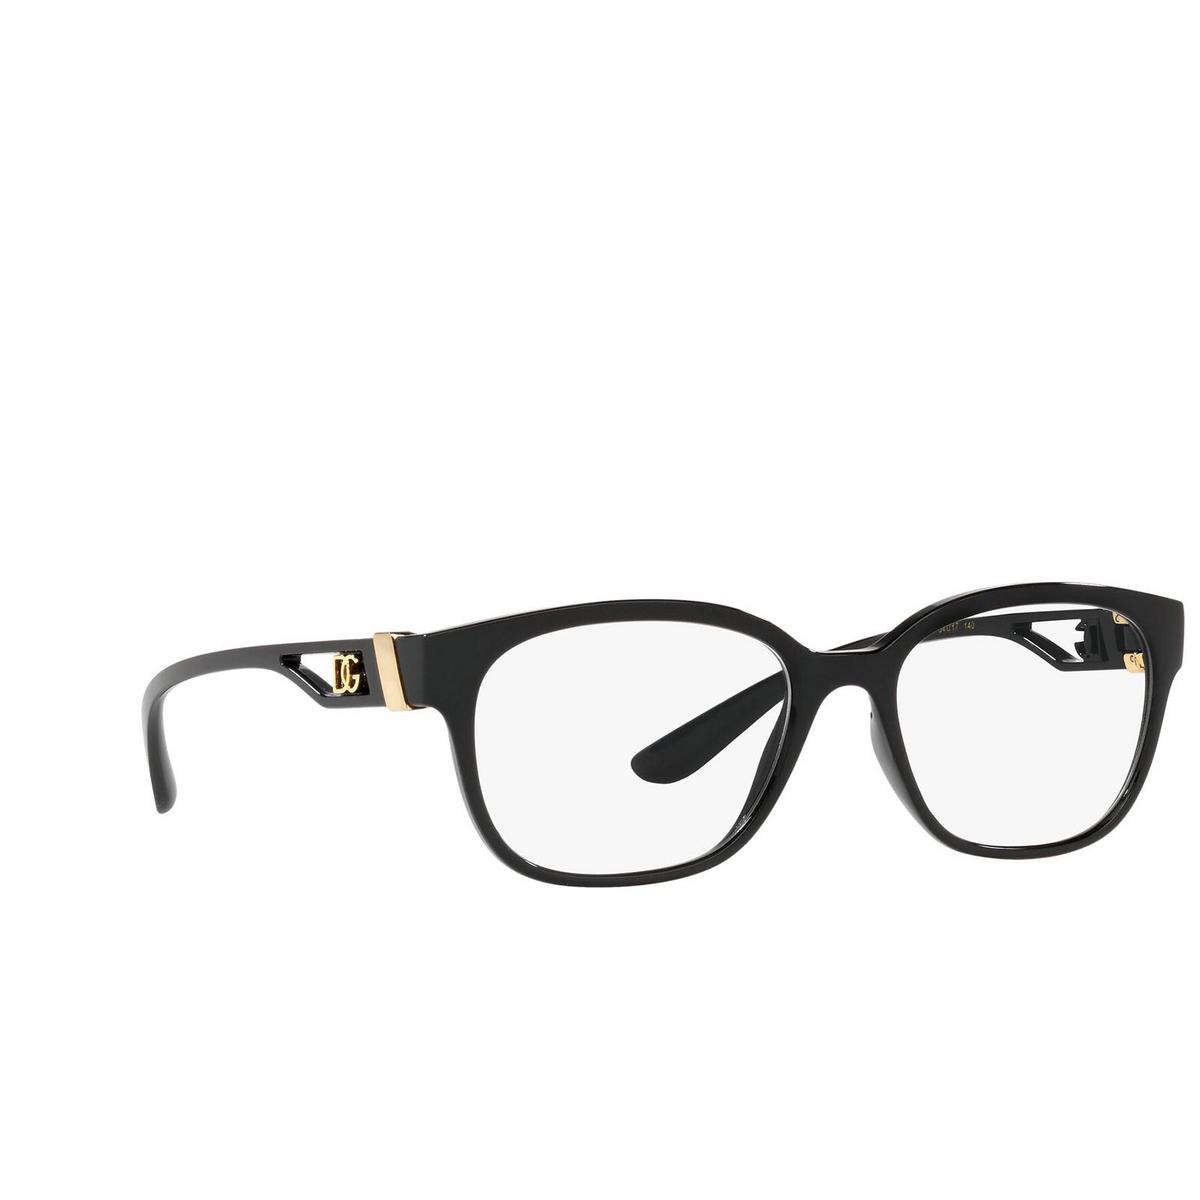 Dolce & Gabbana® Square Eyeglasses: DG5066 color Black 501 - three-quarters view.